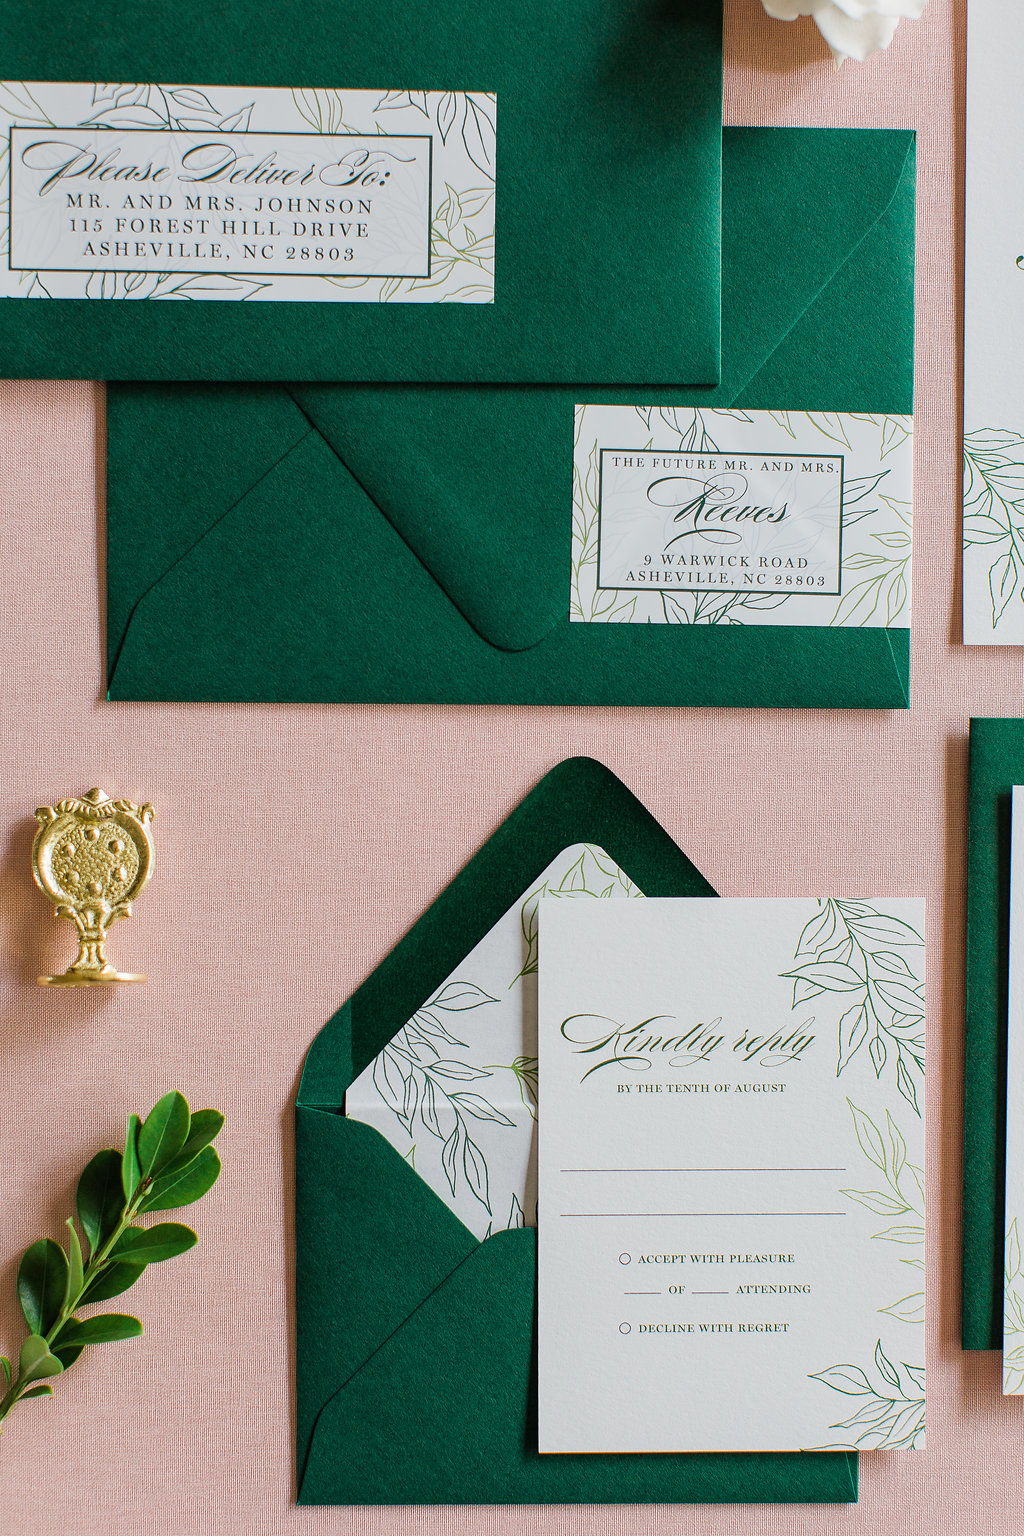 Heather Hand Drawn Wedding Invitation Greenery Feathered Heart PrintsFHP-28.jpg